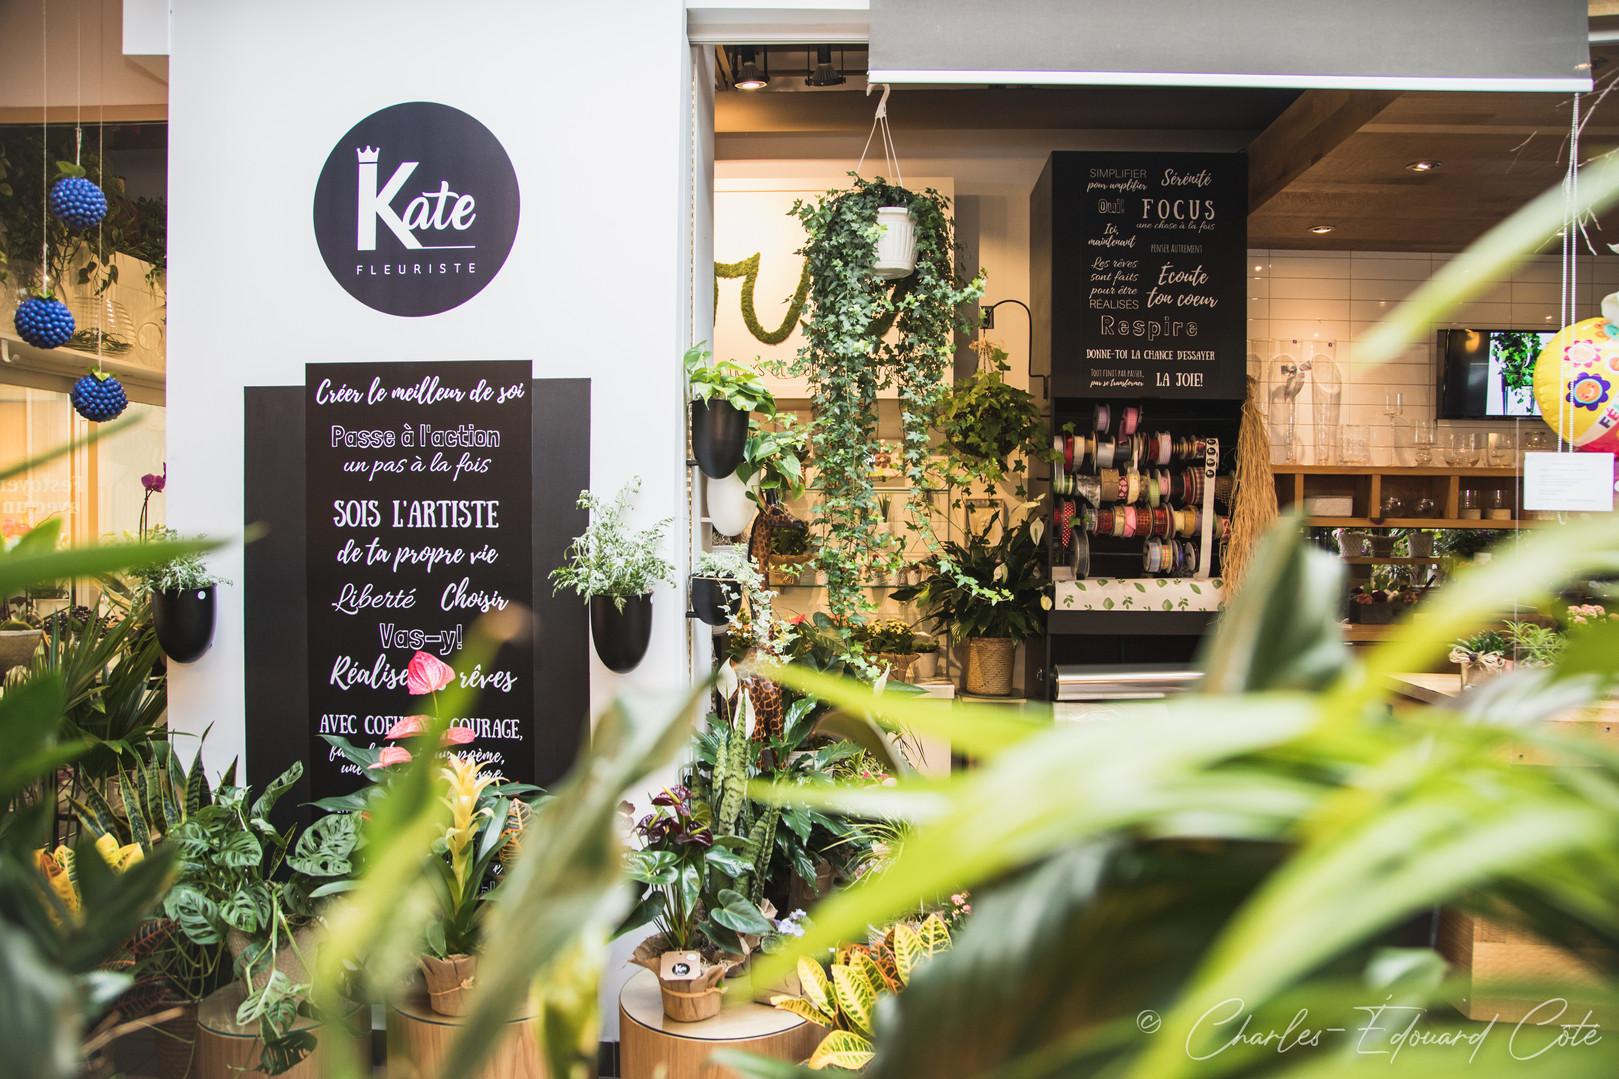 KateFleuriste-Boutique-03.jpg